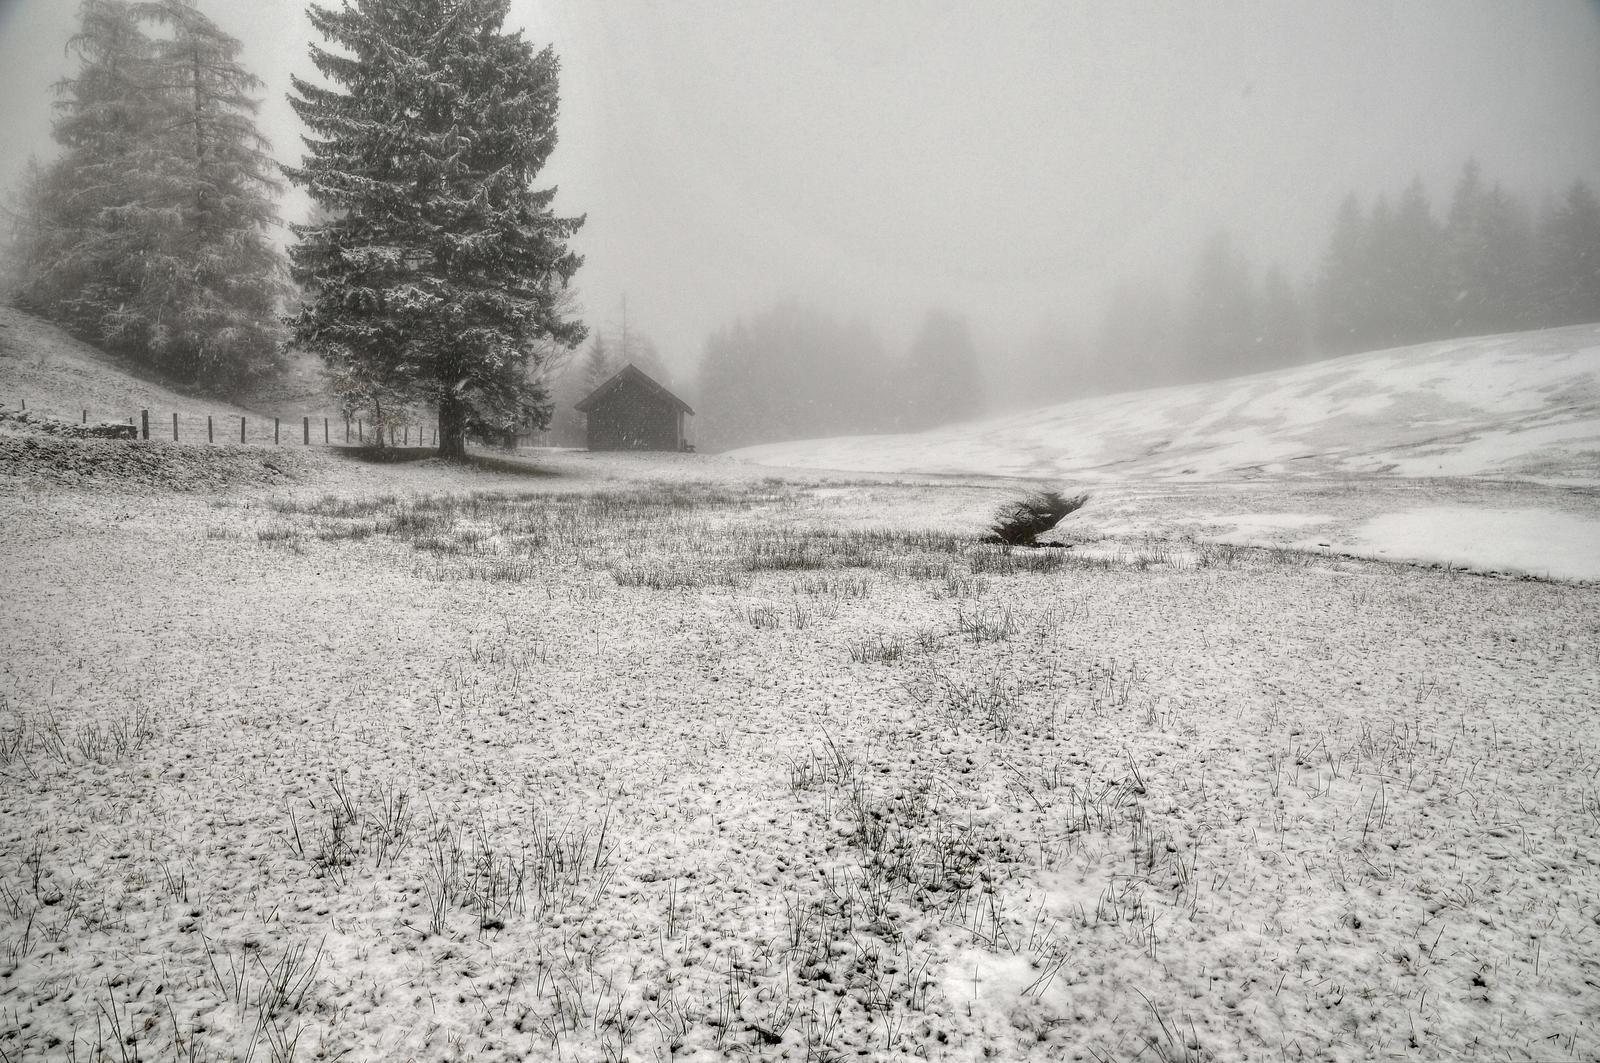 Snowfall Background by Burtn